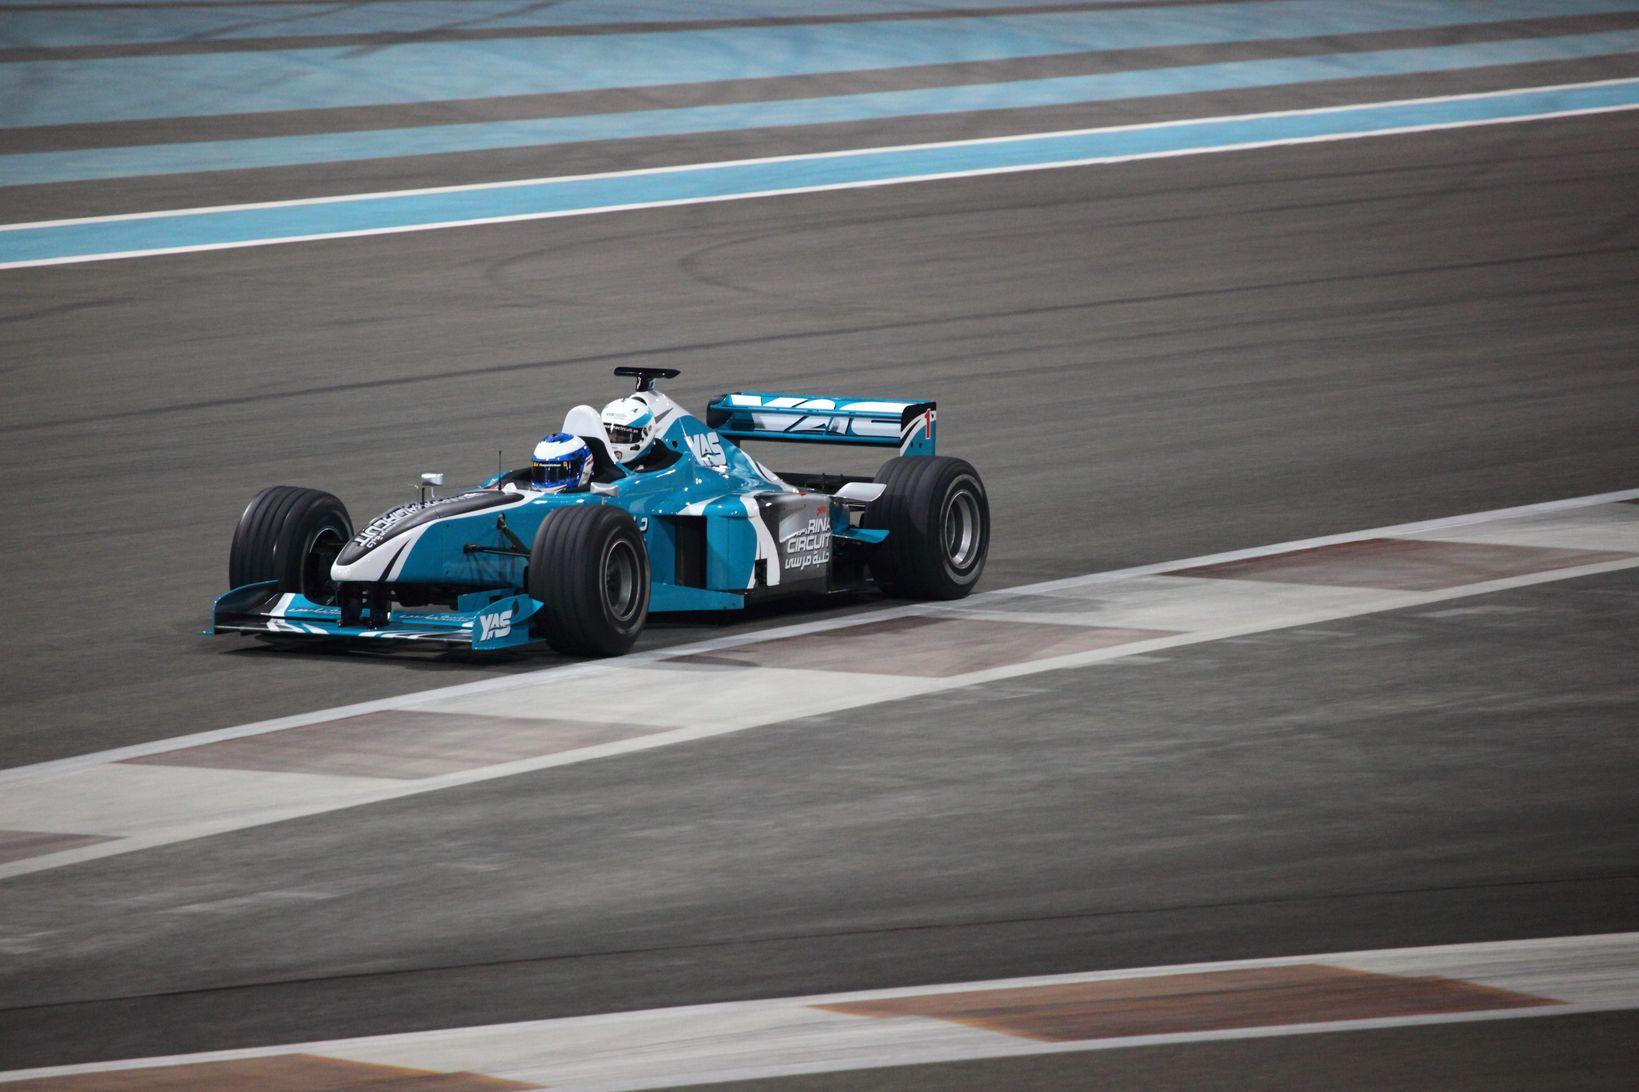 Abu Dhabi Grand Prix 2021